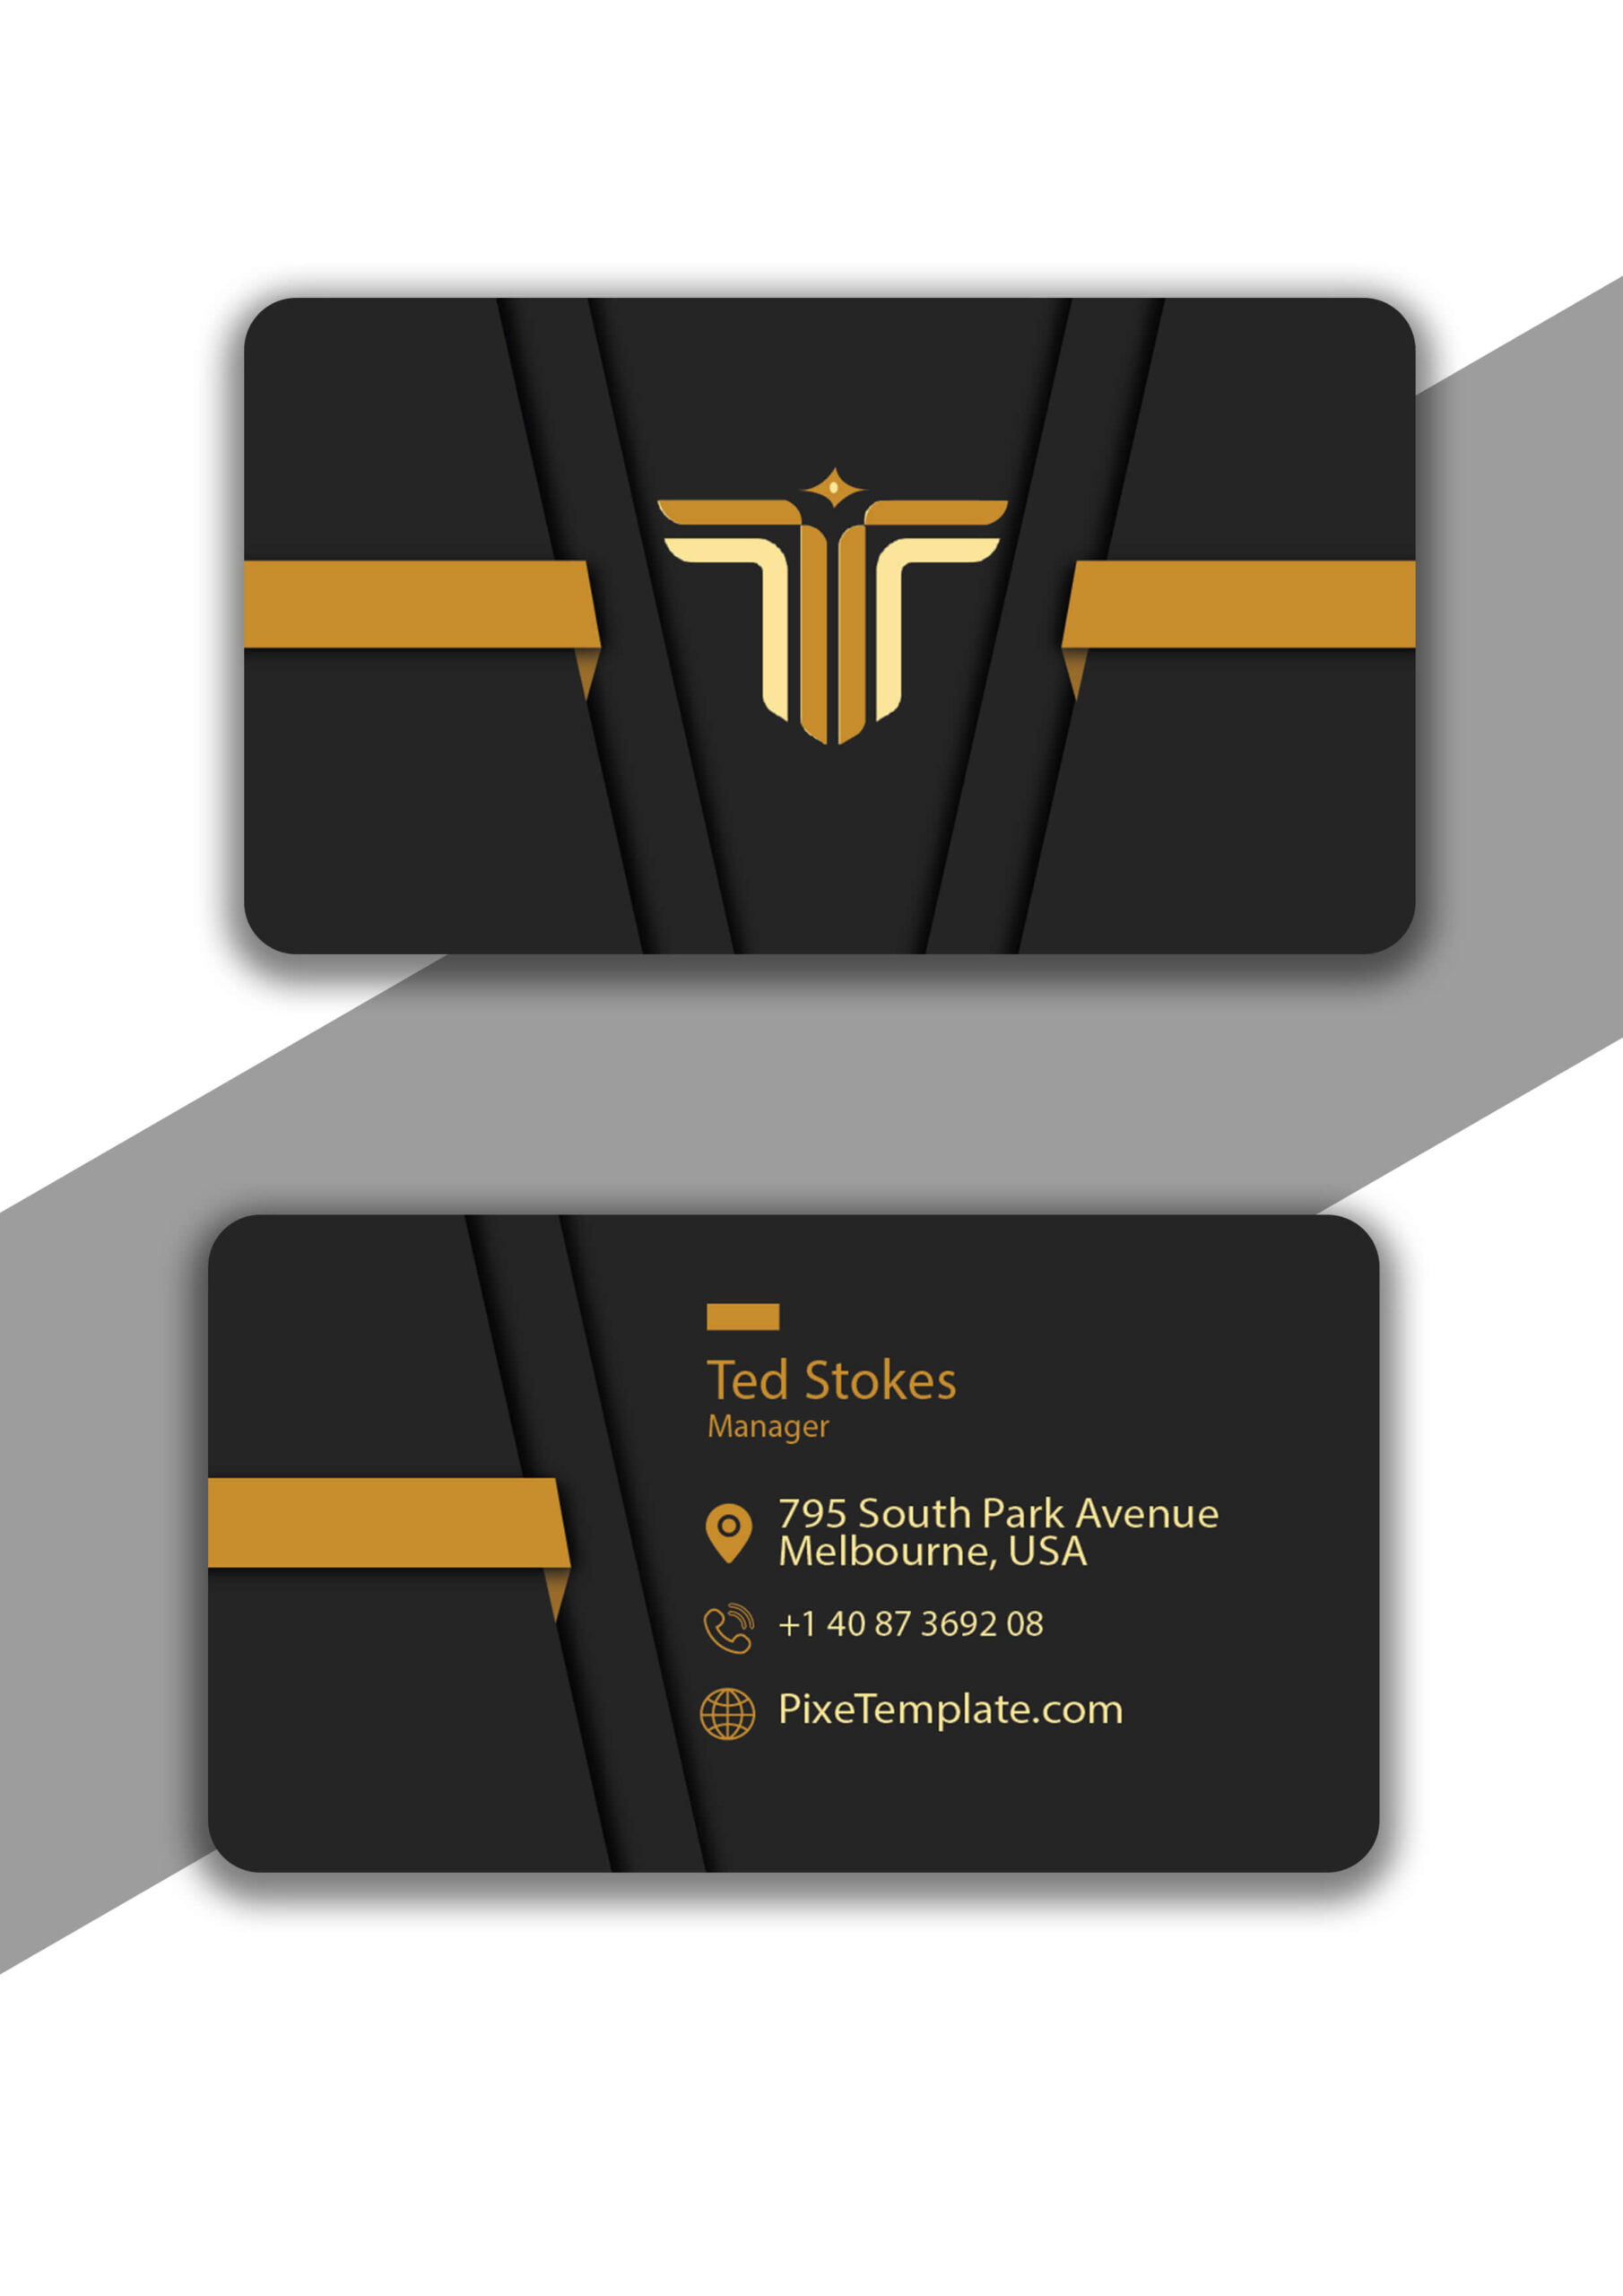 Dark Gray and Golden Business Card Design in Illustrator